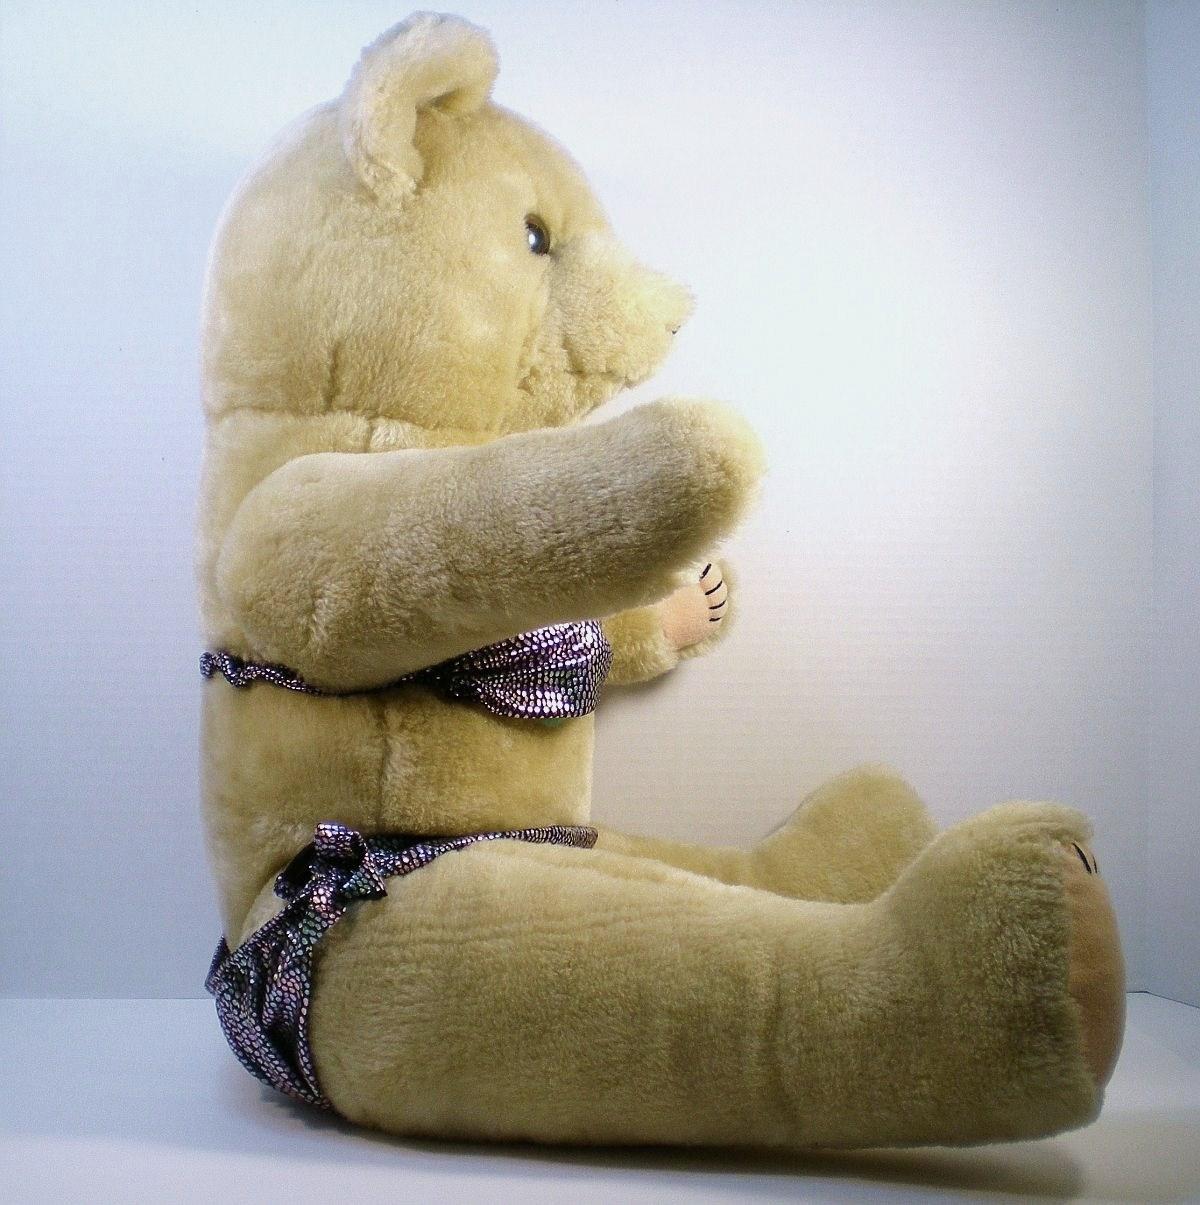 Image 1 of Teddy Bear 25 in ready for the beach bear Cannon Falls 1990